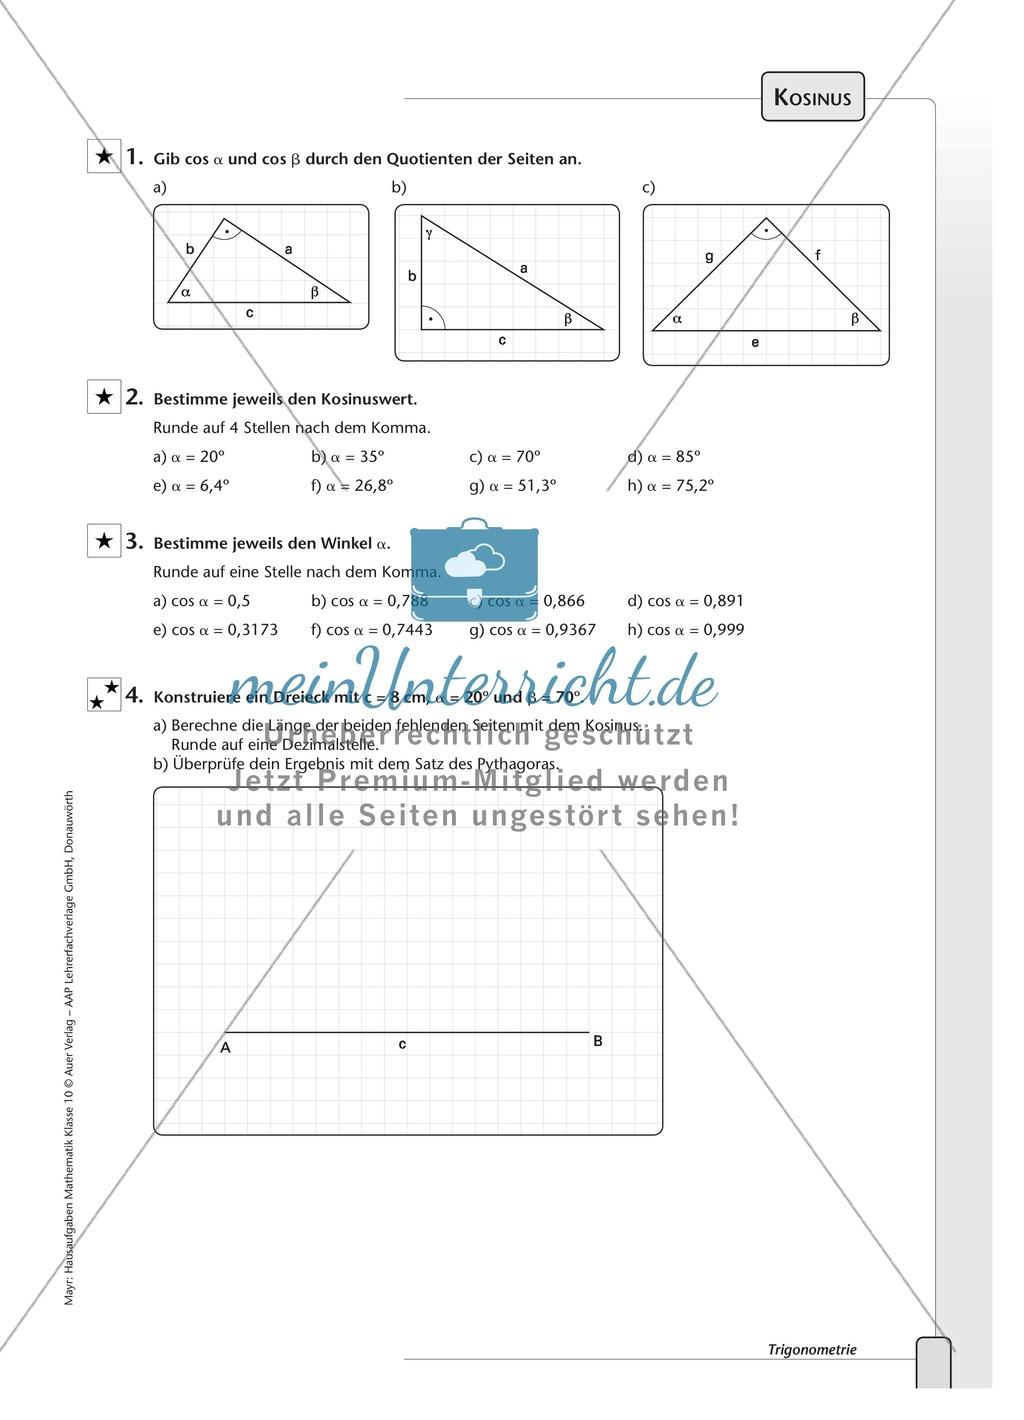 Atemberaubend Trigonometrie Beweise Arbeitsblatt Fotos - Super ...